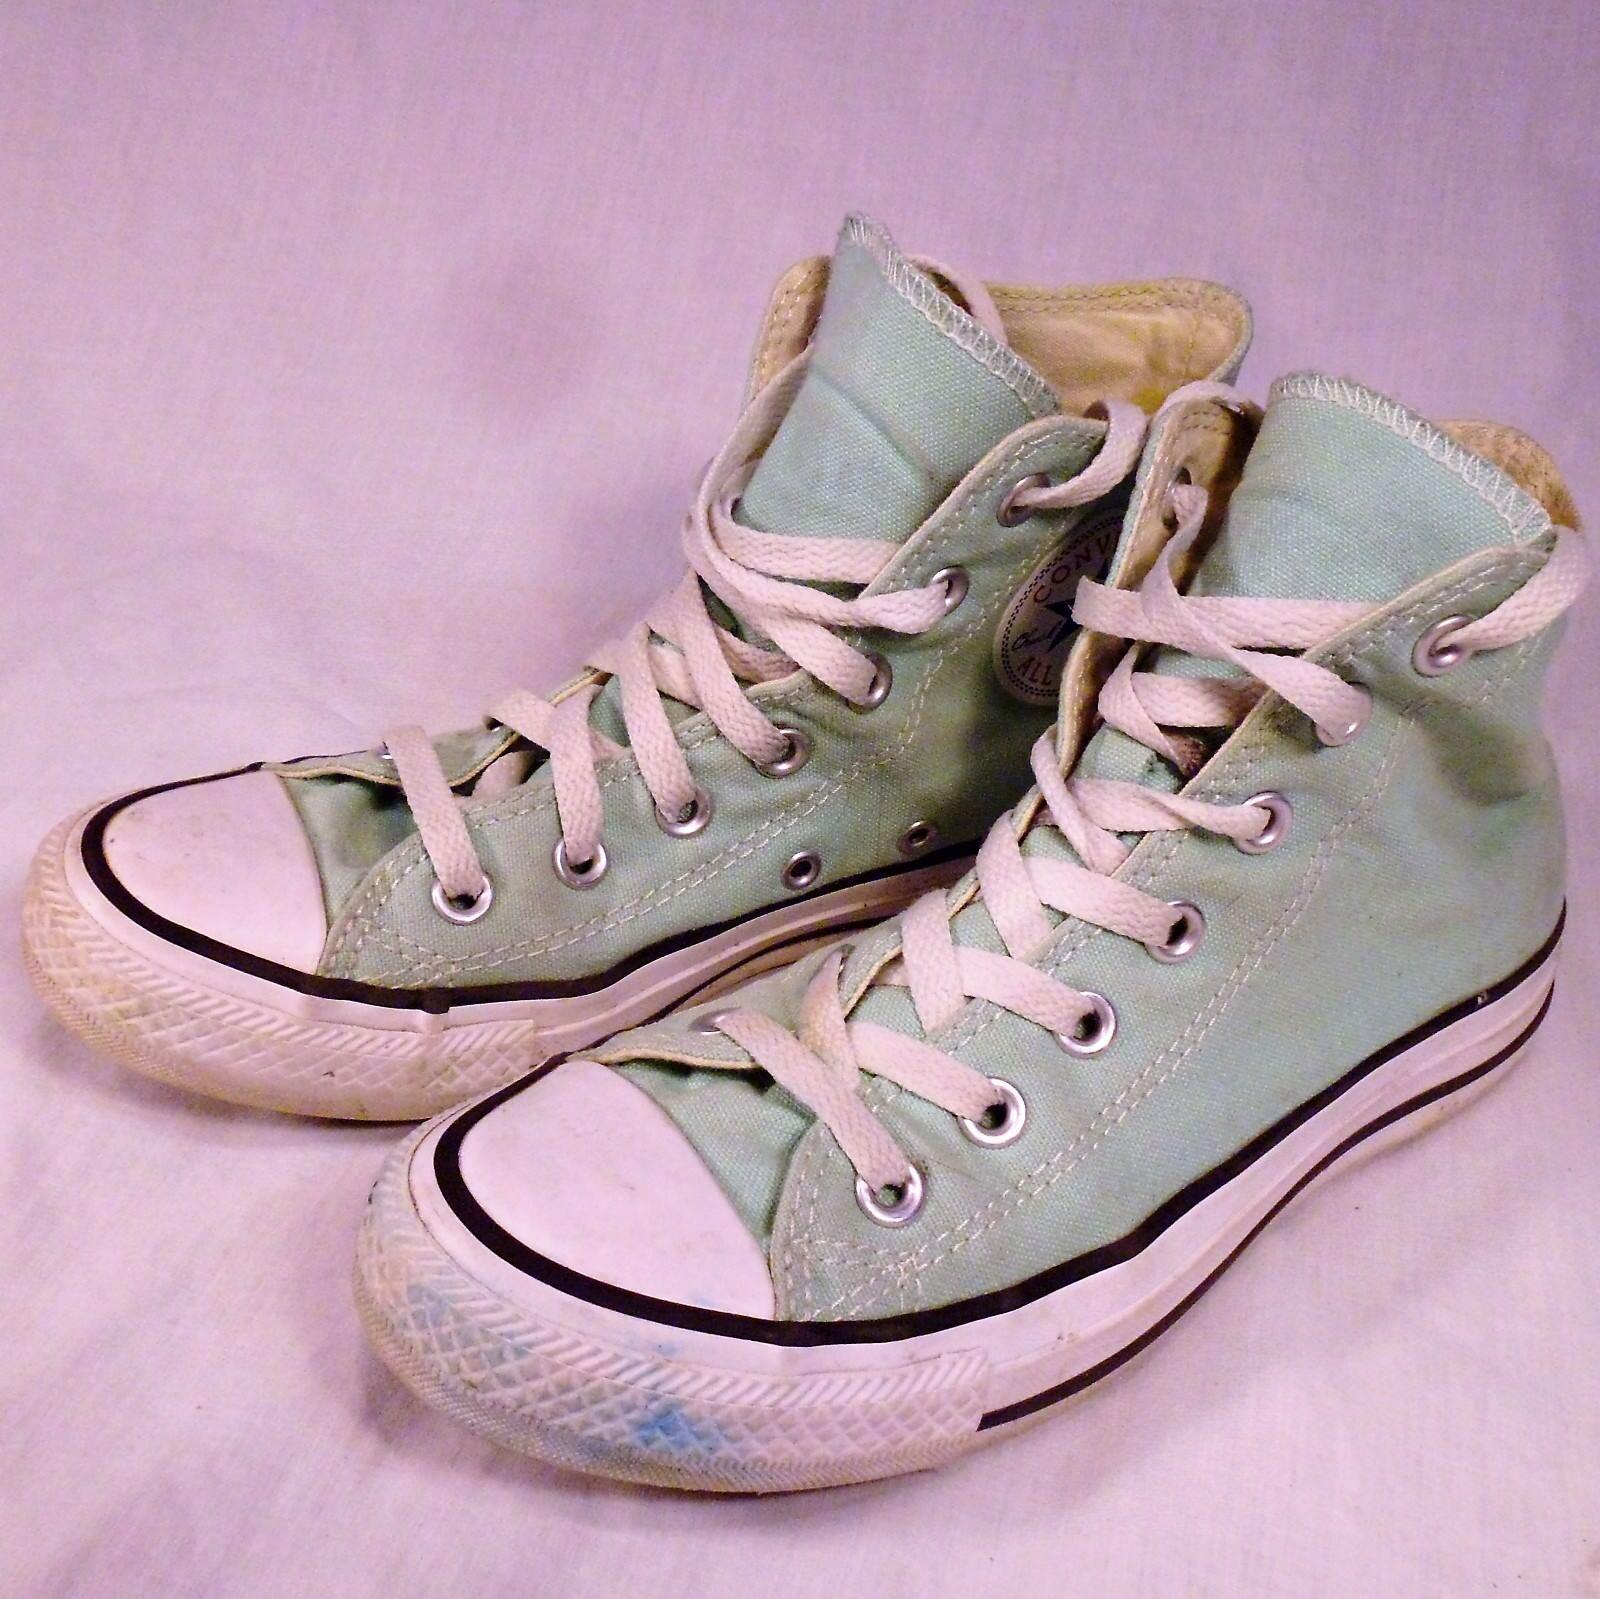 Converse All Stars High Tops shoes Mint Green Mens 5 Womens Size 10 Chucks